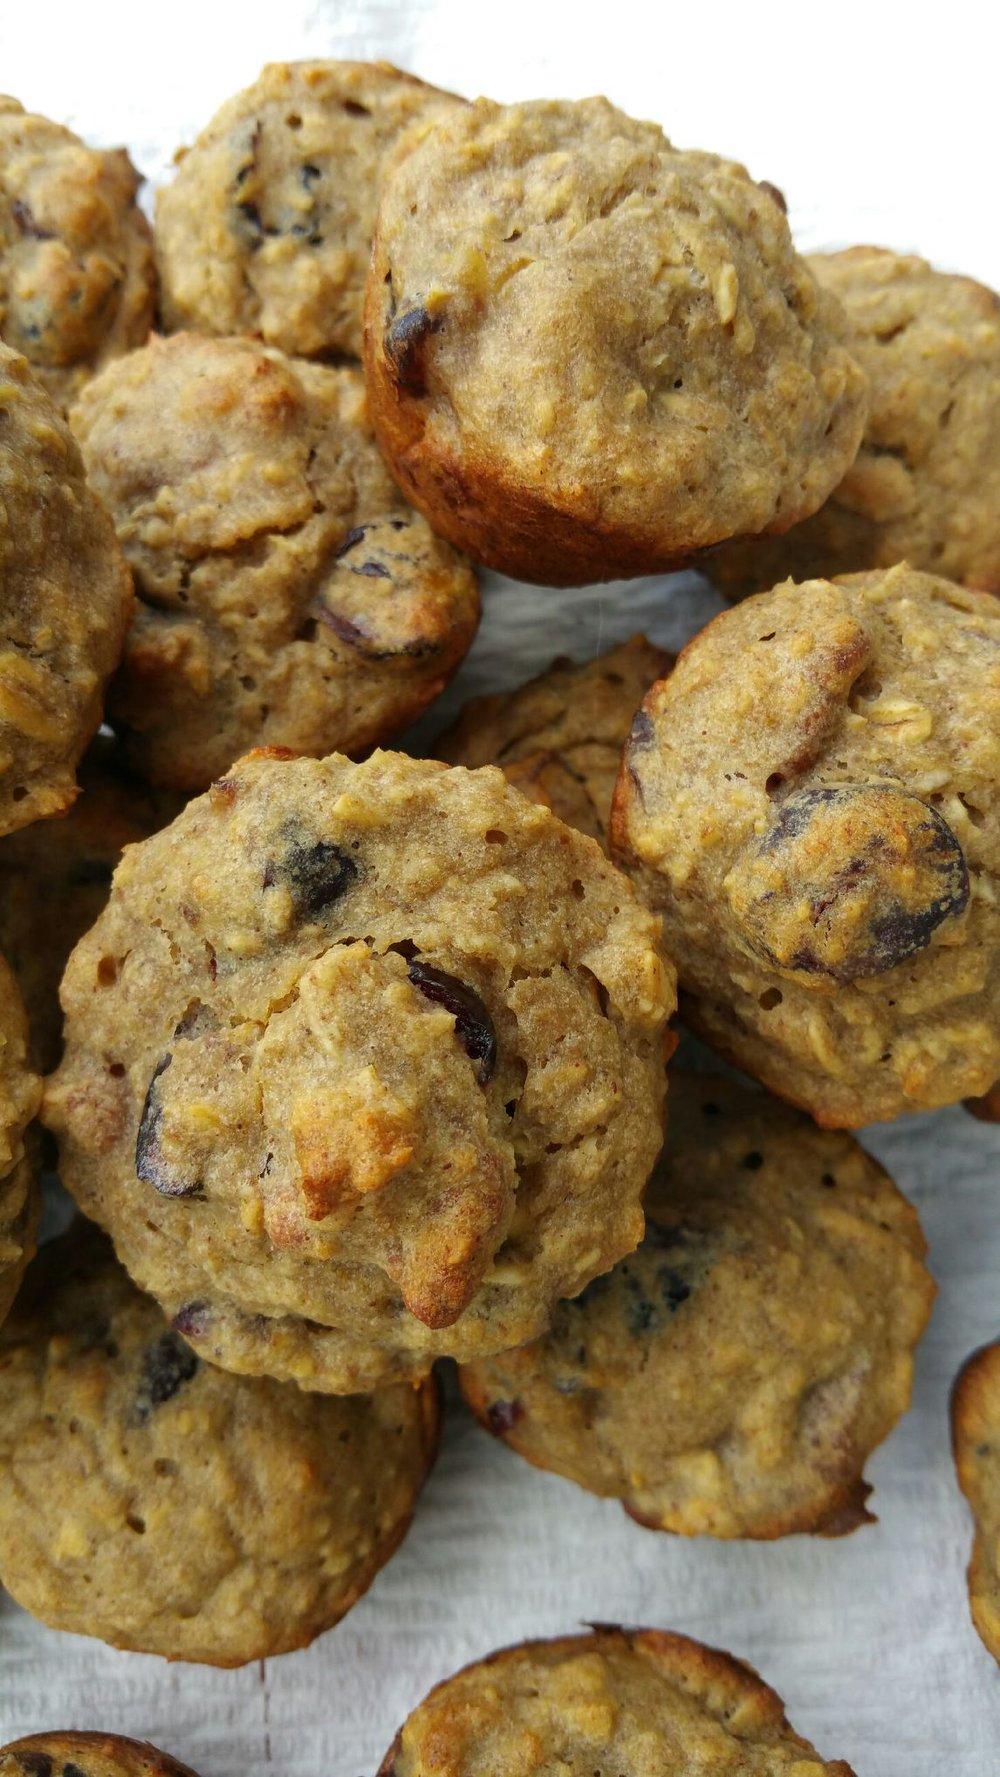 Oatmeal cranberry banana muffins